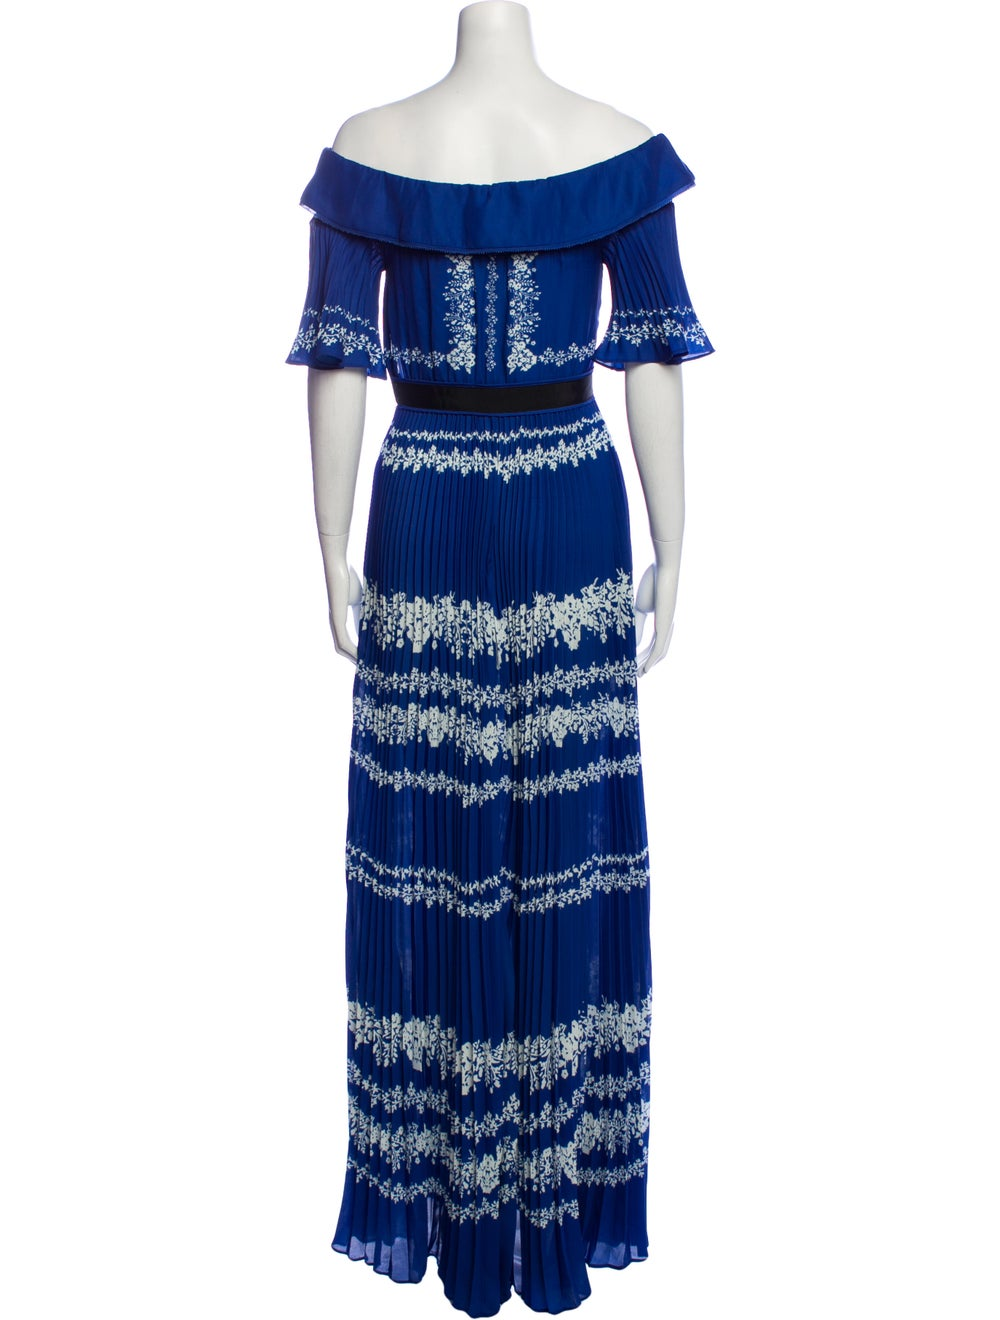 Self-Portrait Printed Long Dress Blue - image 3